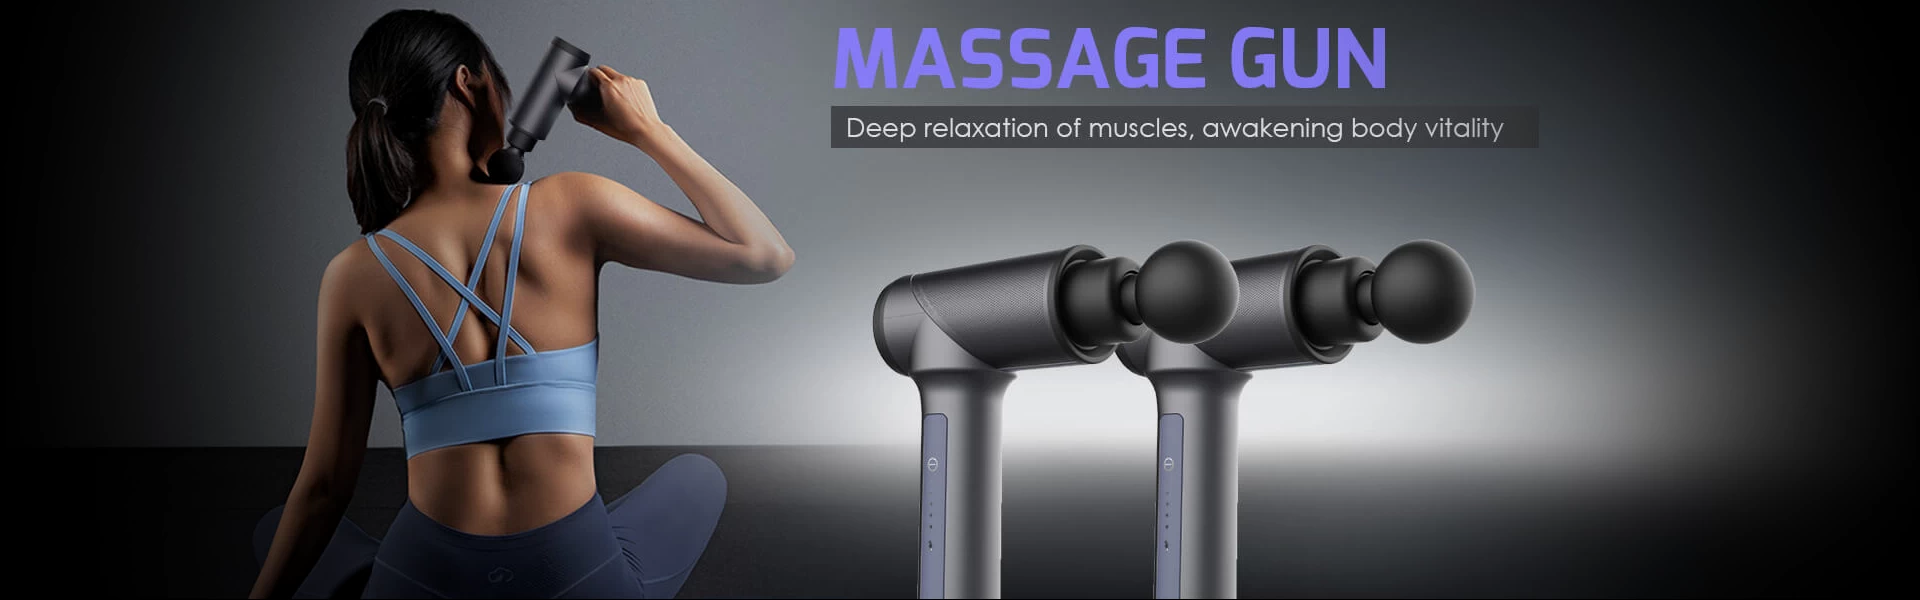 Best Massage Home Use